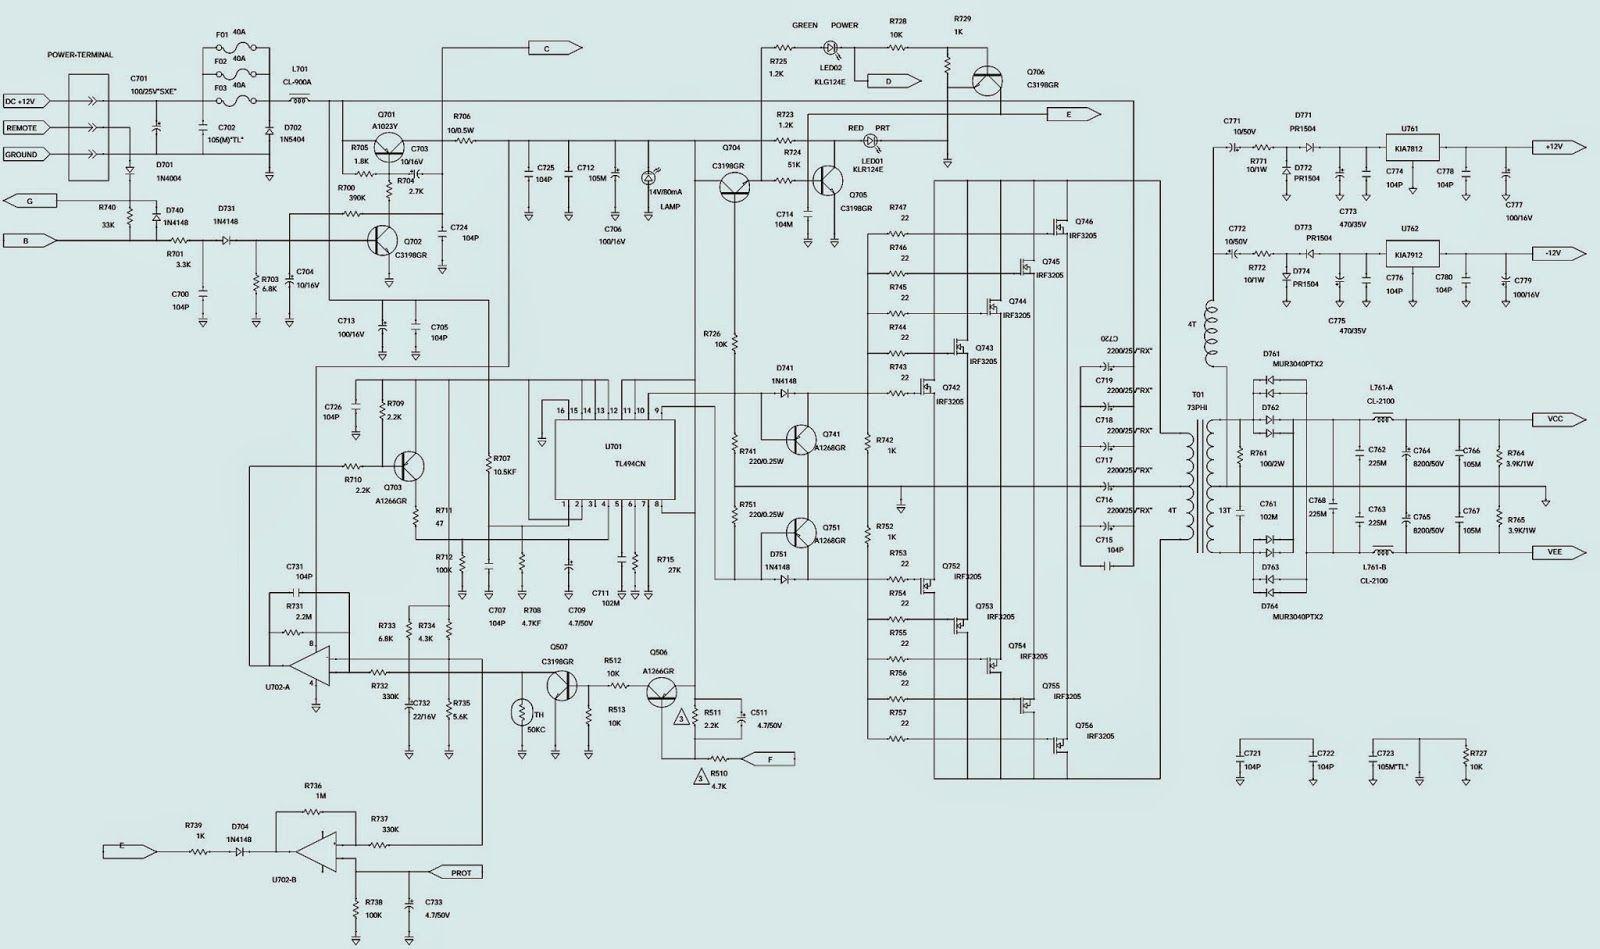 jbl wiring diagram diagram data schema jbl wiring diagram jbl bp 1200 sub wiring diagram wiring [ 1600 x 949 Pixel ]